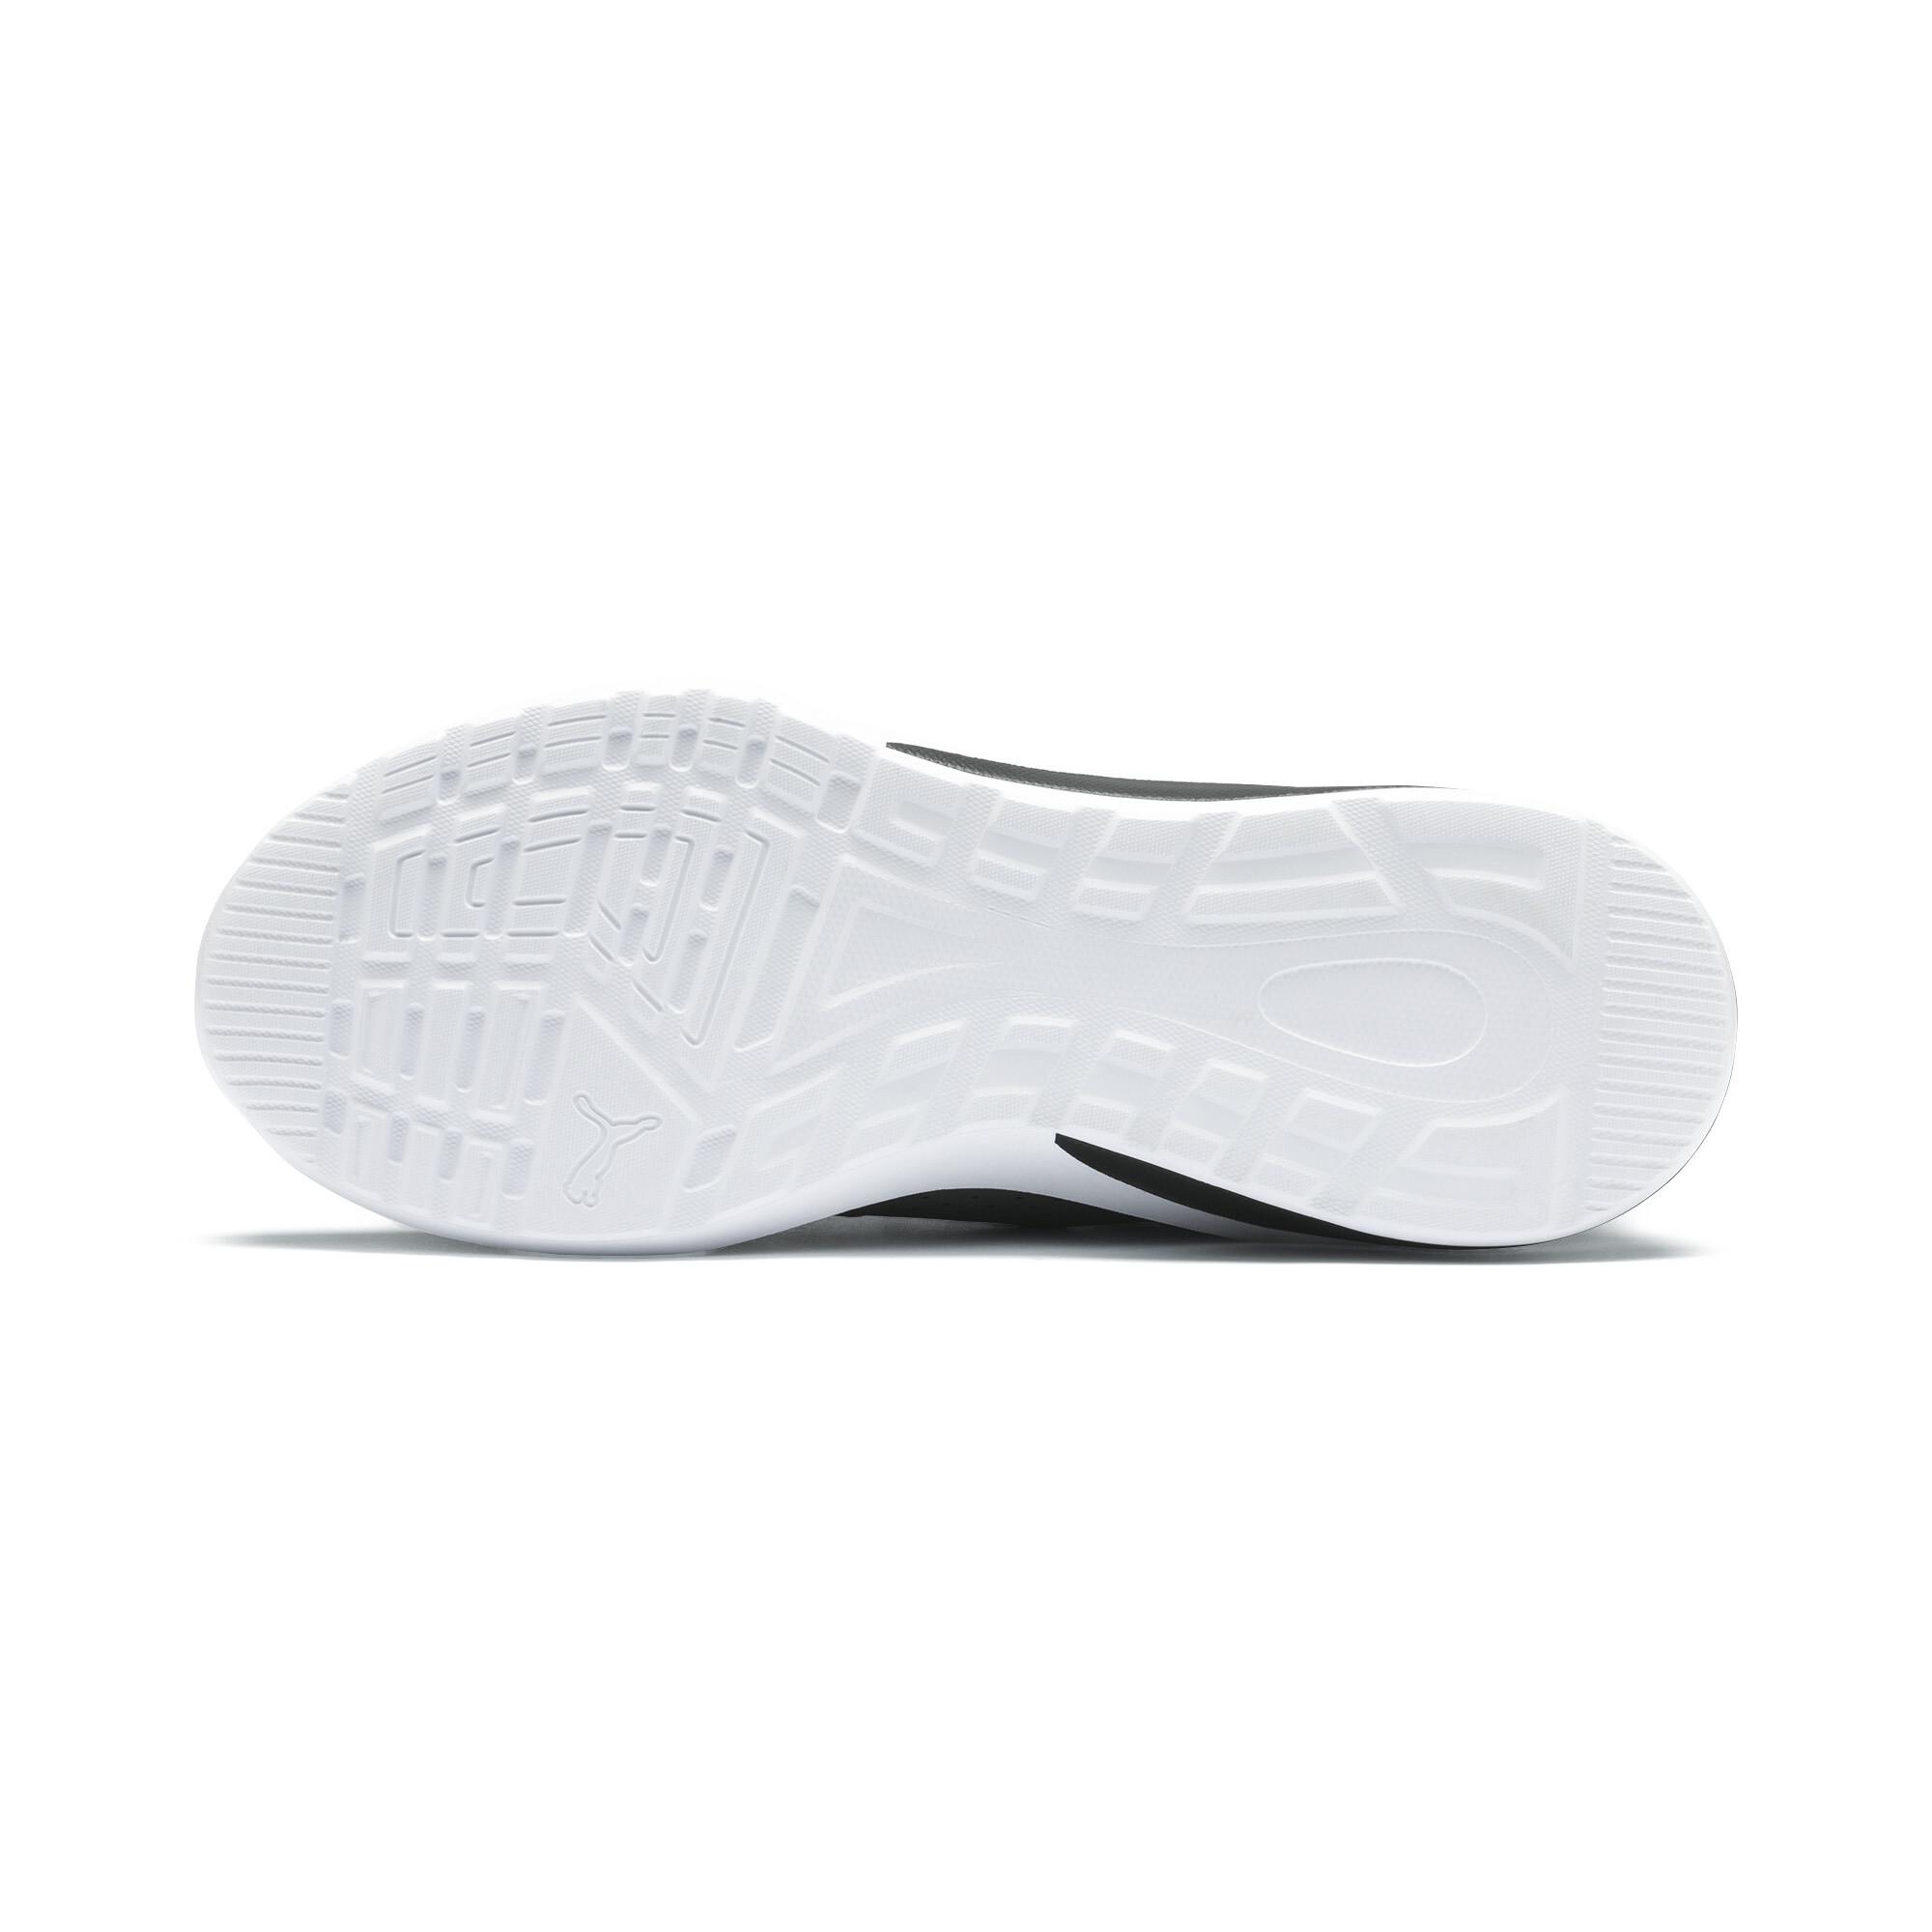 PUMA-Emergence-Men-039-s-Sneakers-Men-Shoe-Running thumbnail 18